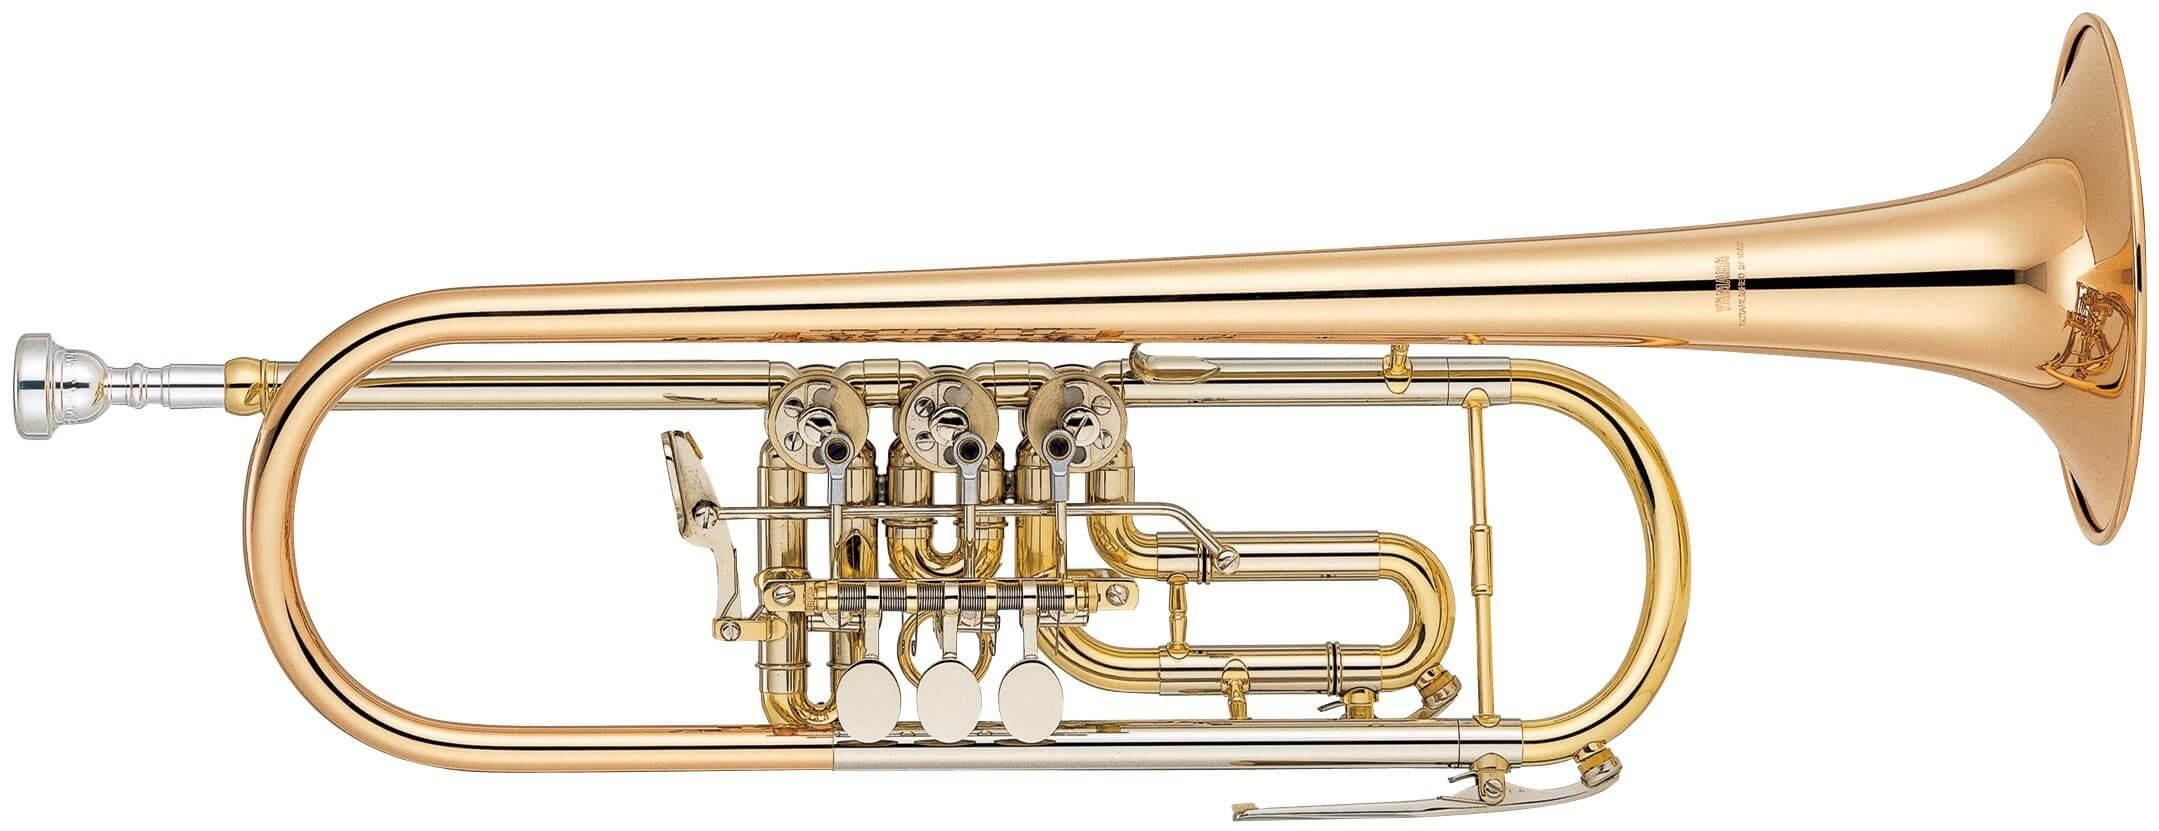 Trompeta De Cilindros Yamaha Ytr-436G Lacada